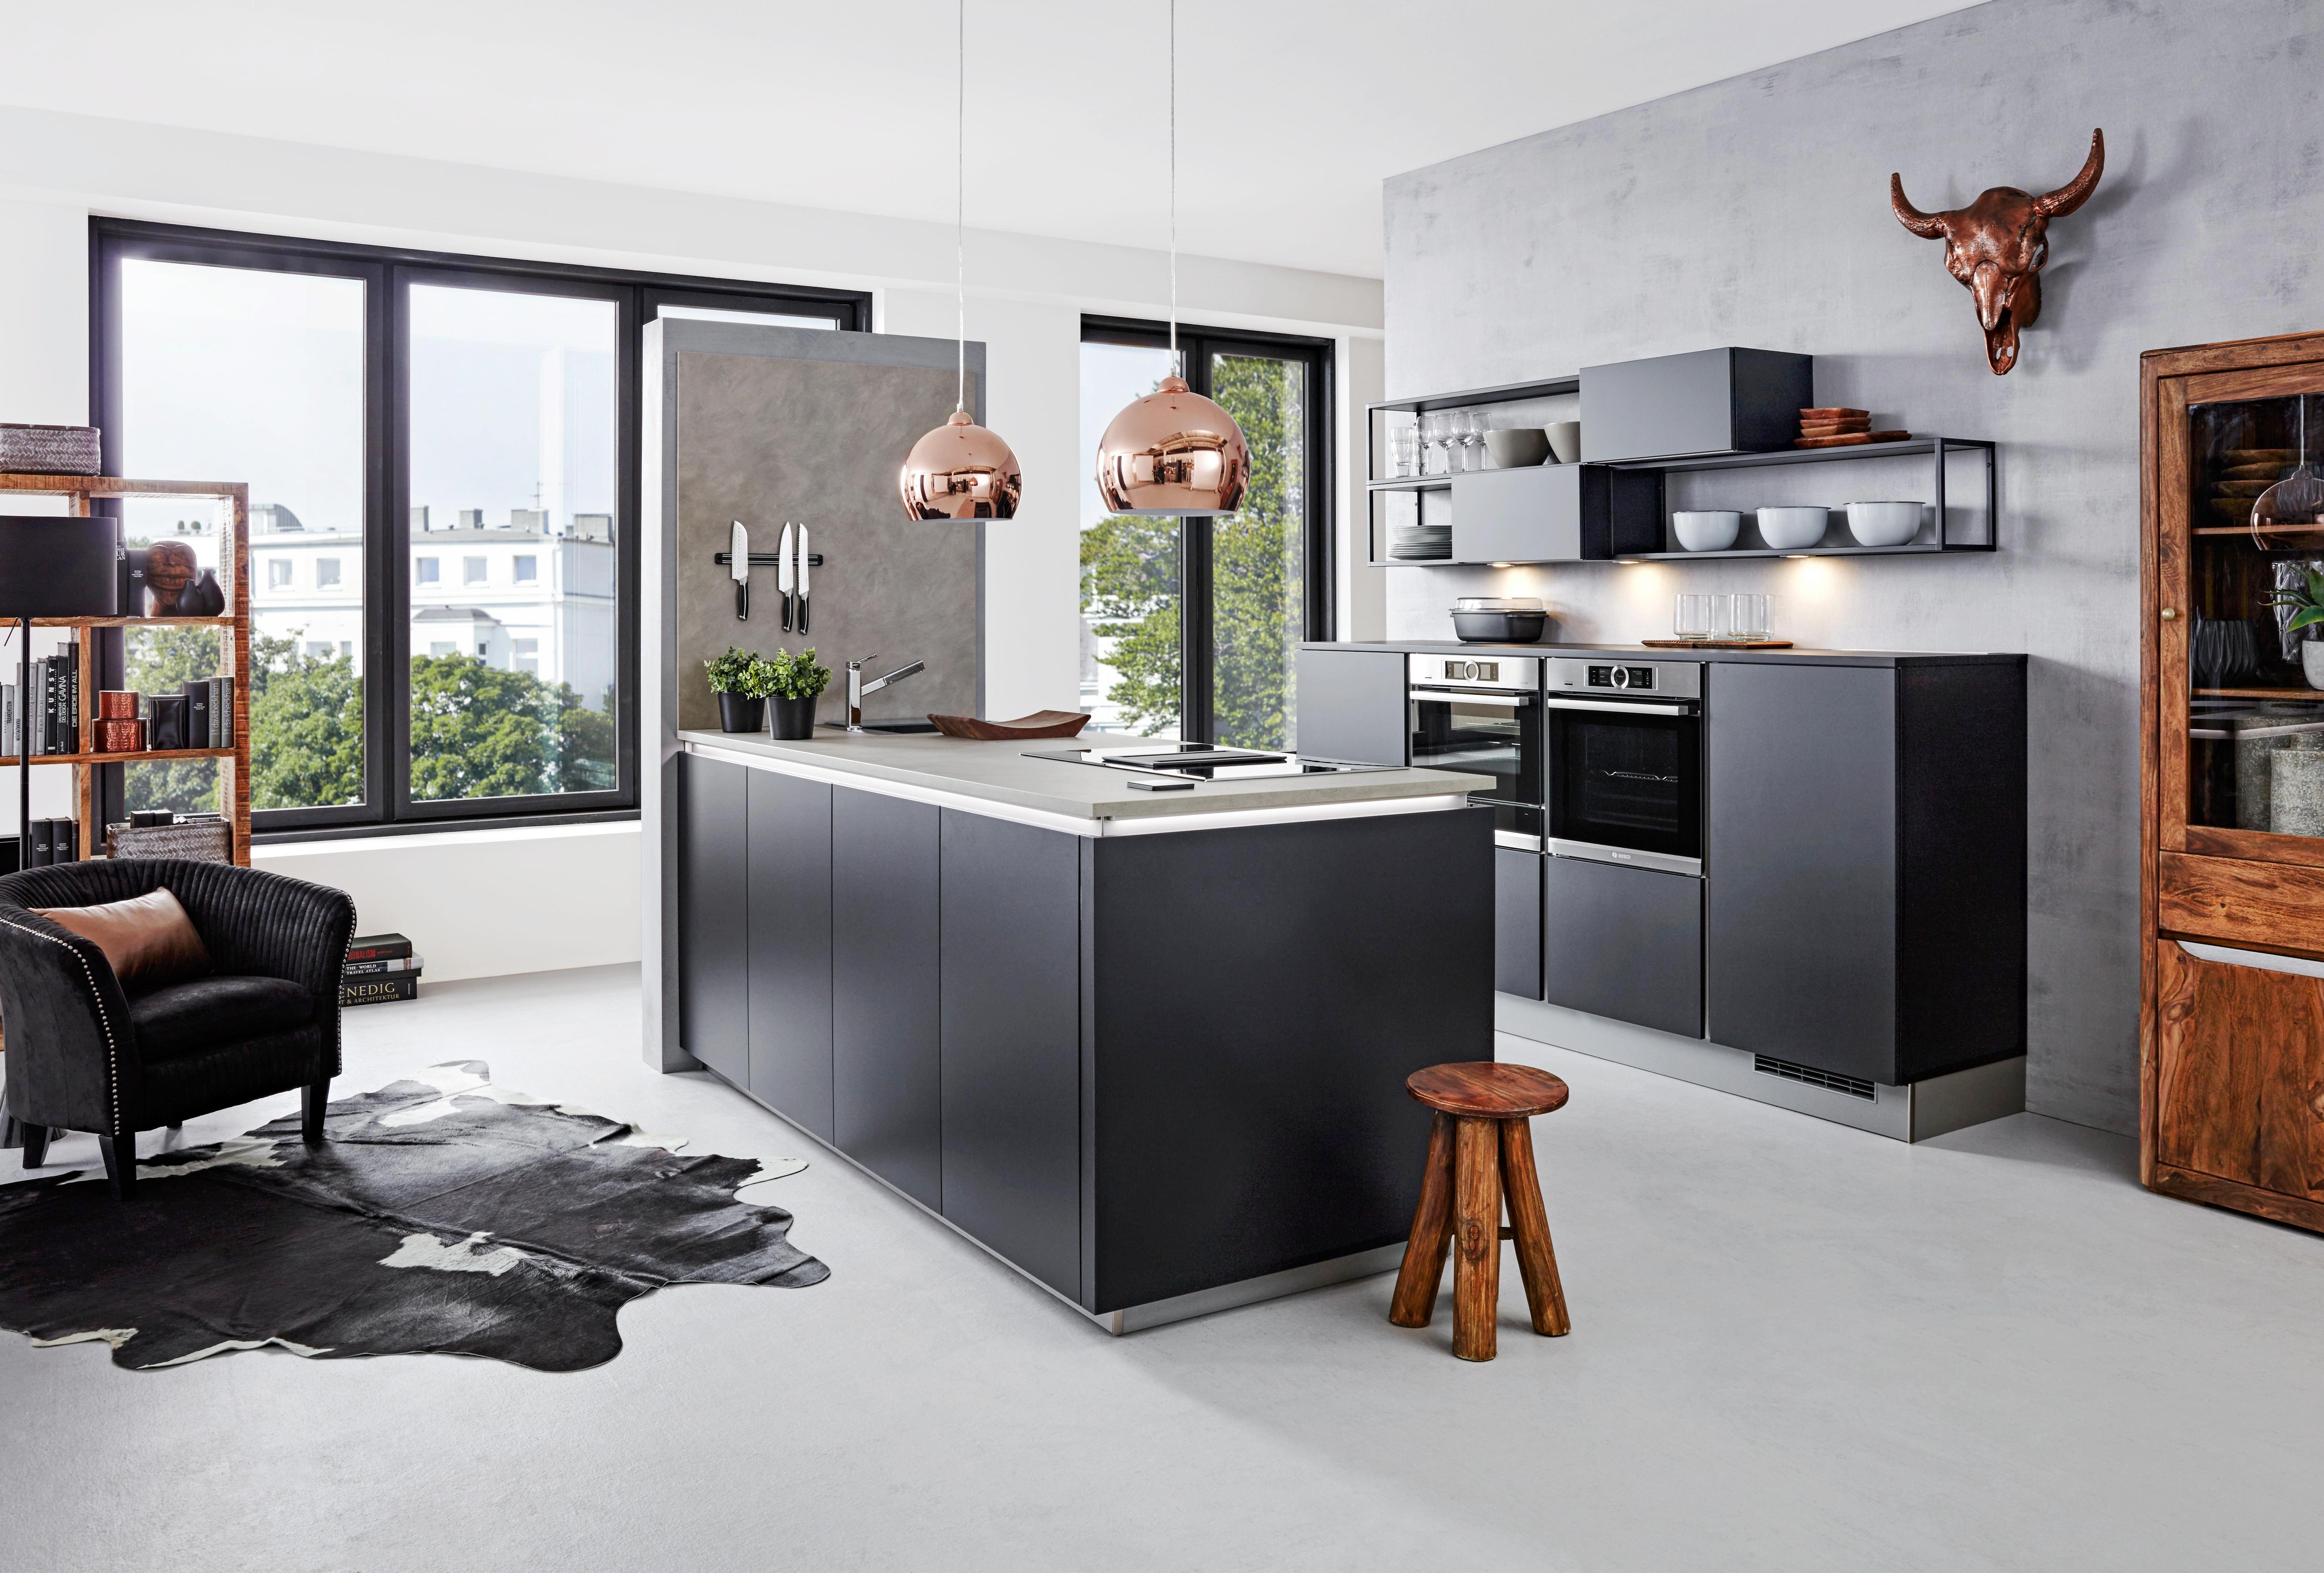 nolte kchen hannover nolte kchen modell alpha lack with nolte kchen hannover alno elektro wien. Black Bedroom Furniture Sets. Home Design Ideas